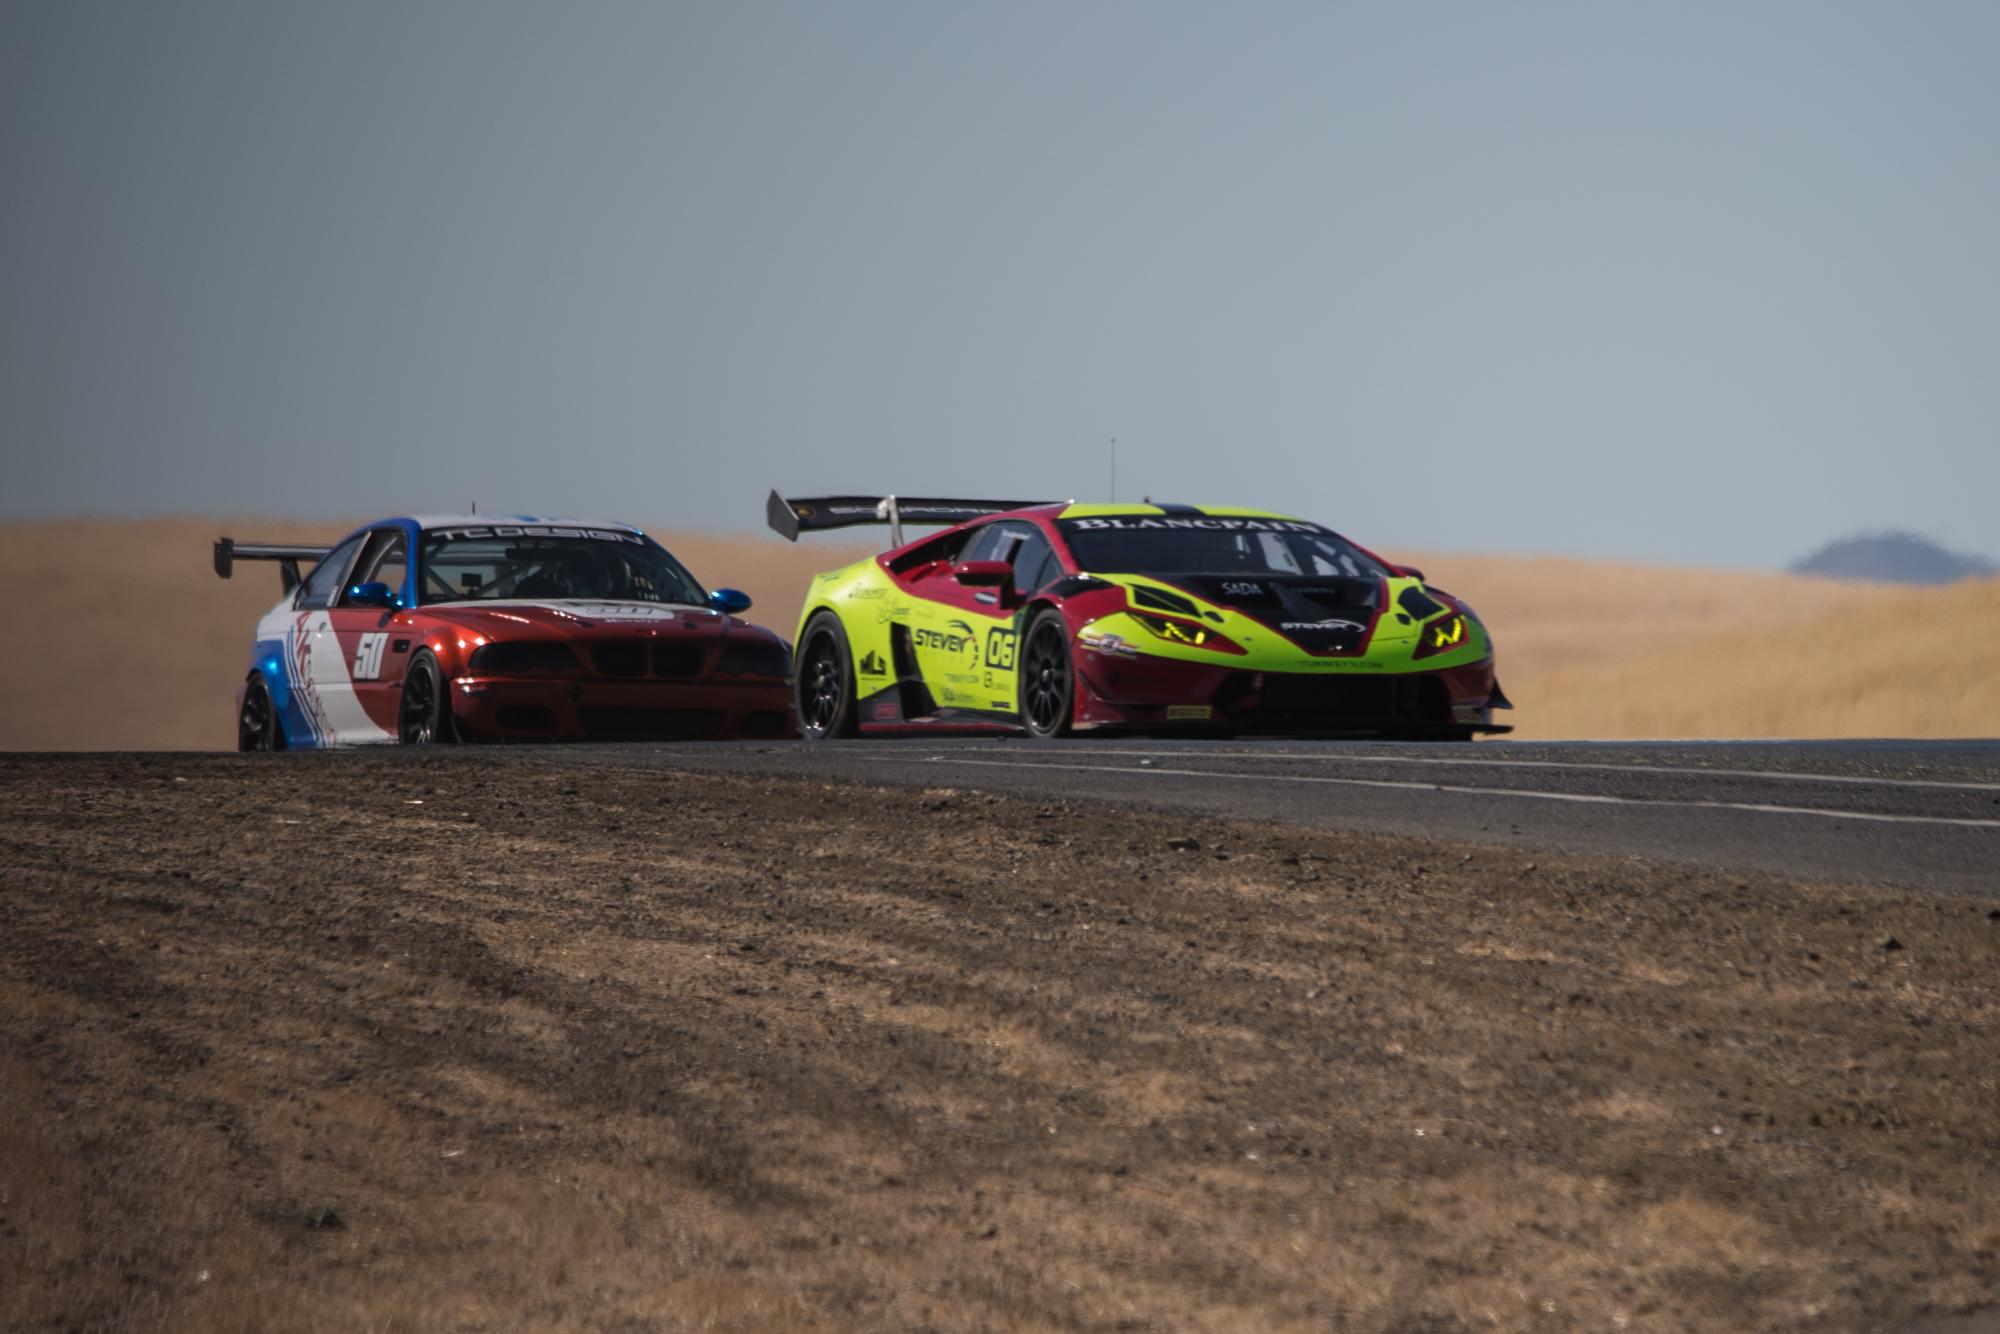 Steven-Racing-20171005-44464.jpg